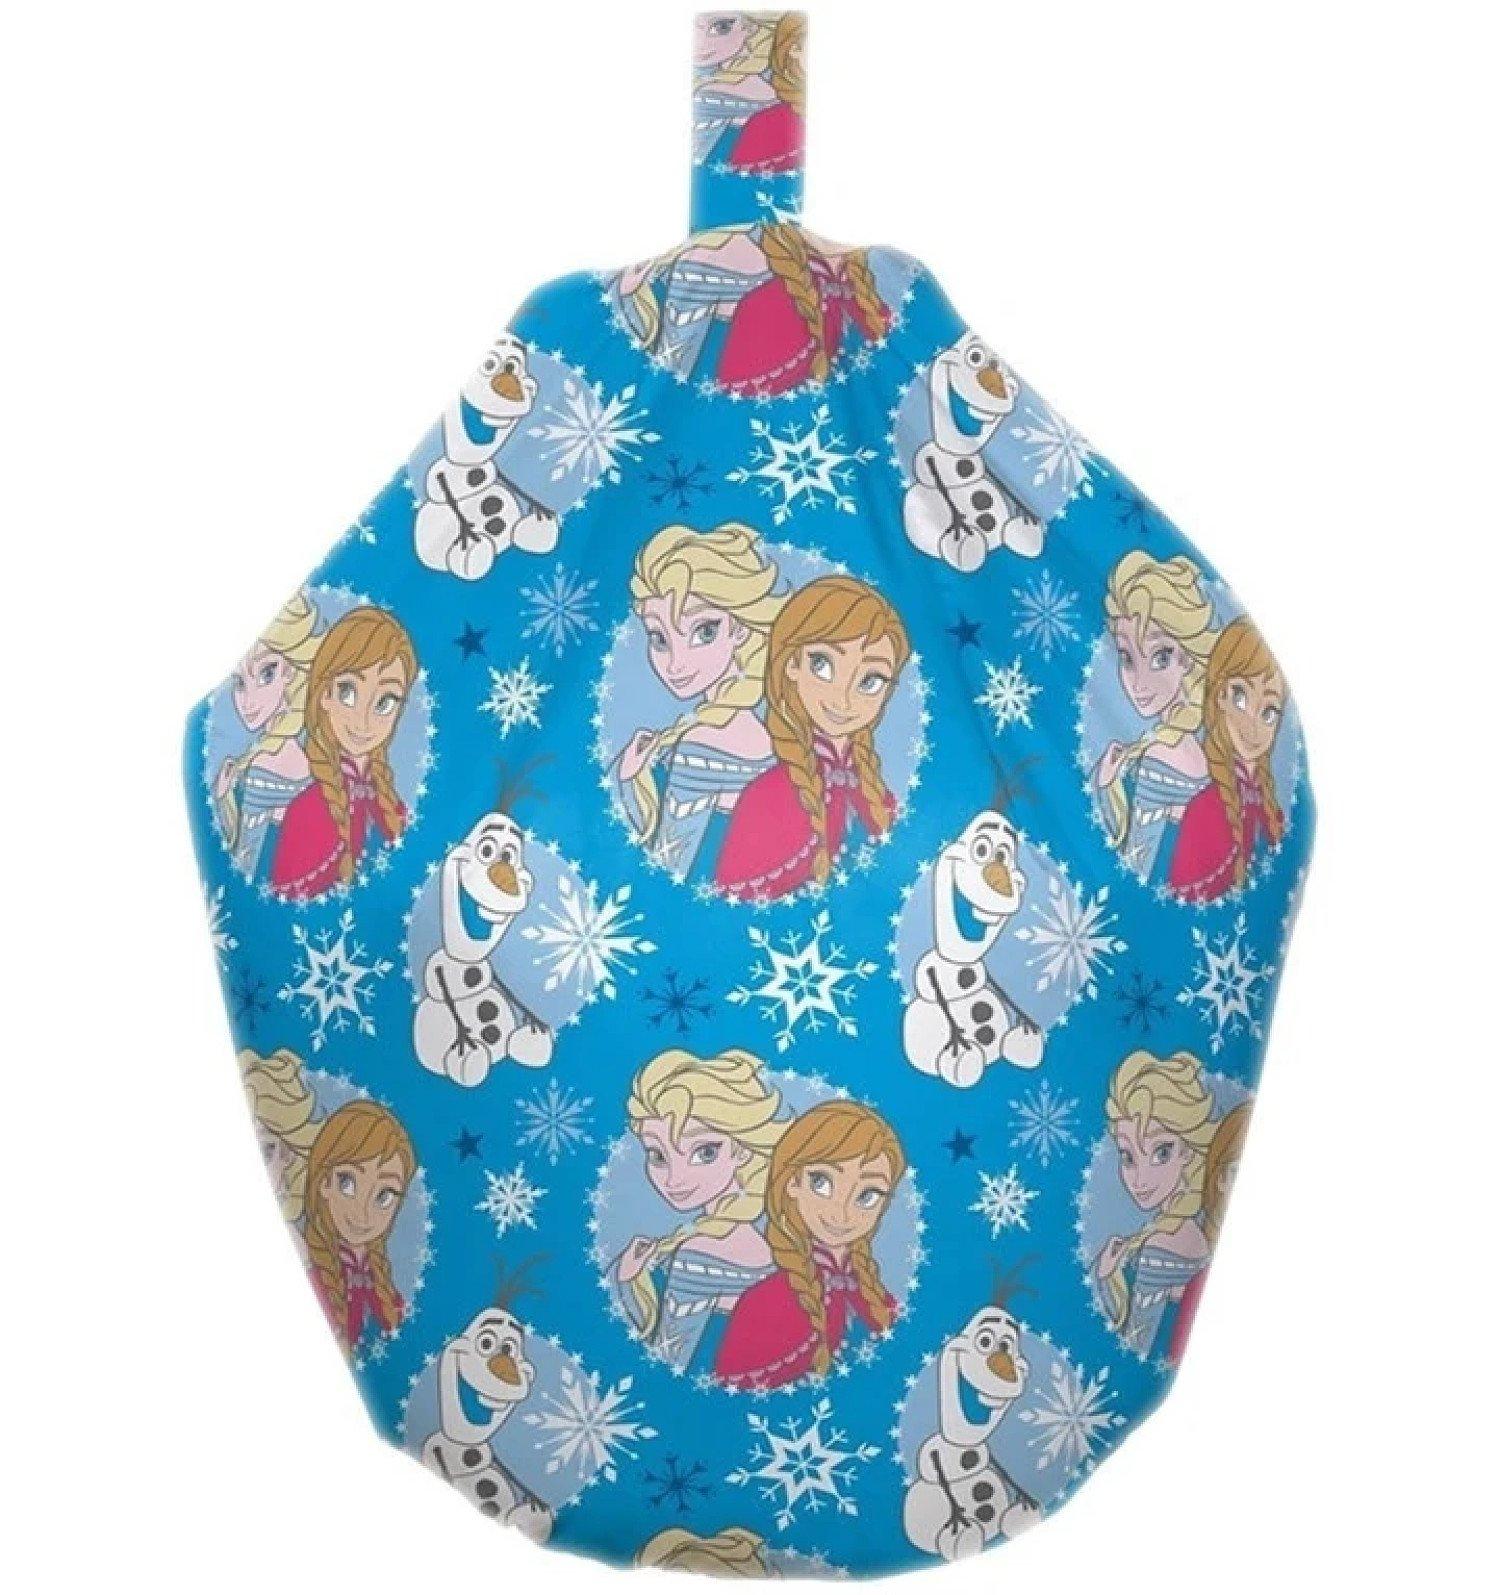 Disney Frozen Beanbag - Arrendelle Free Postage